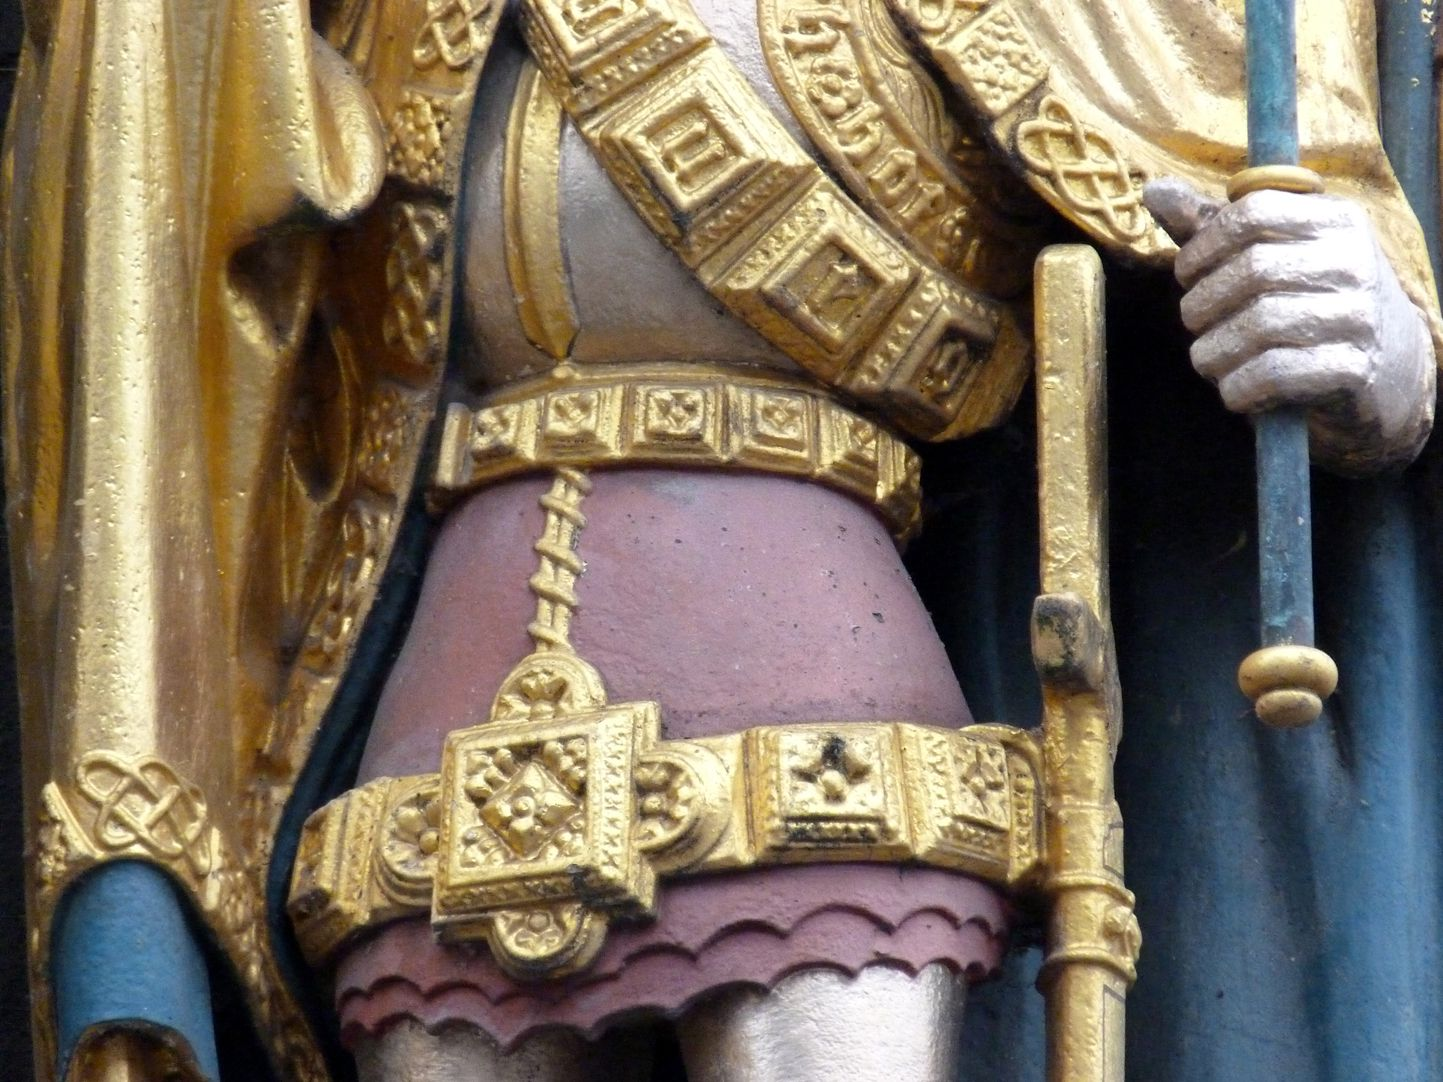 Beautiful fountain King of Bohemia, detail